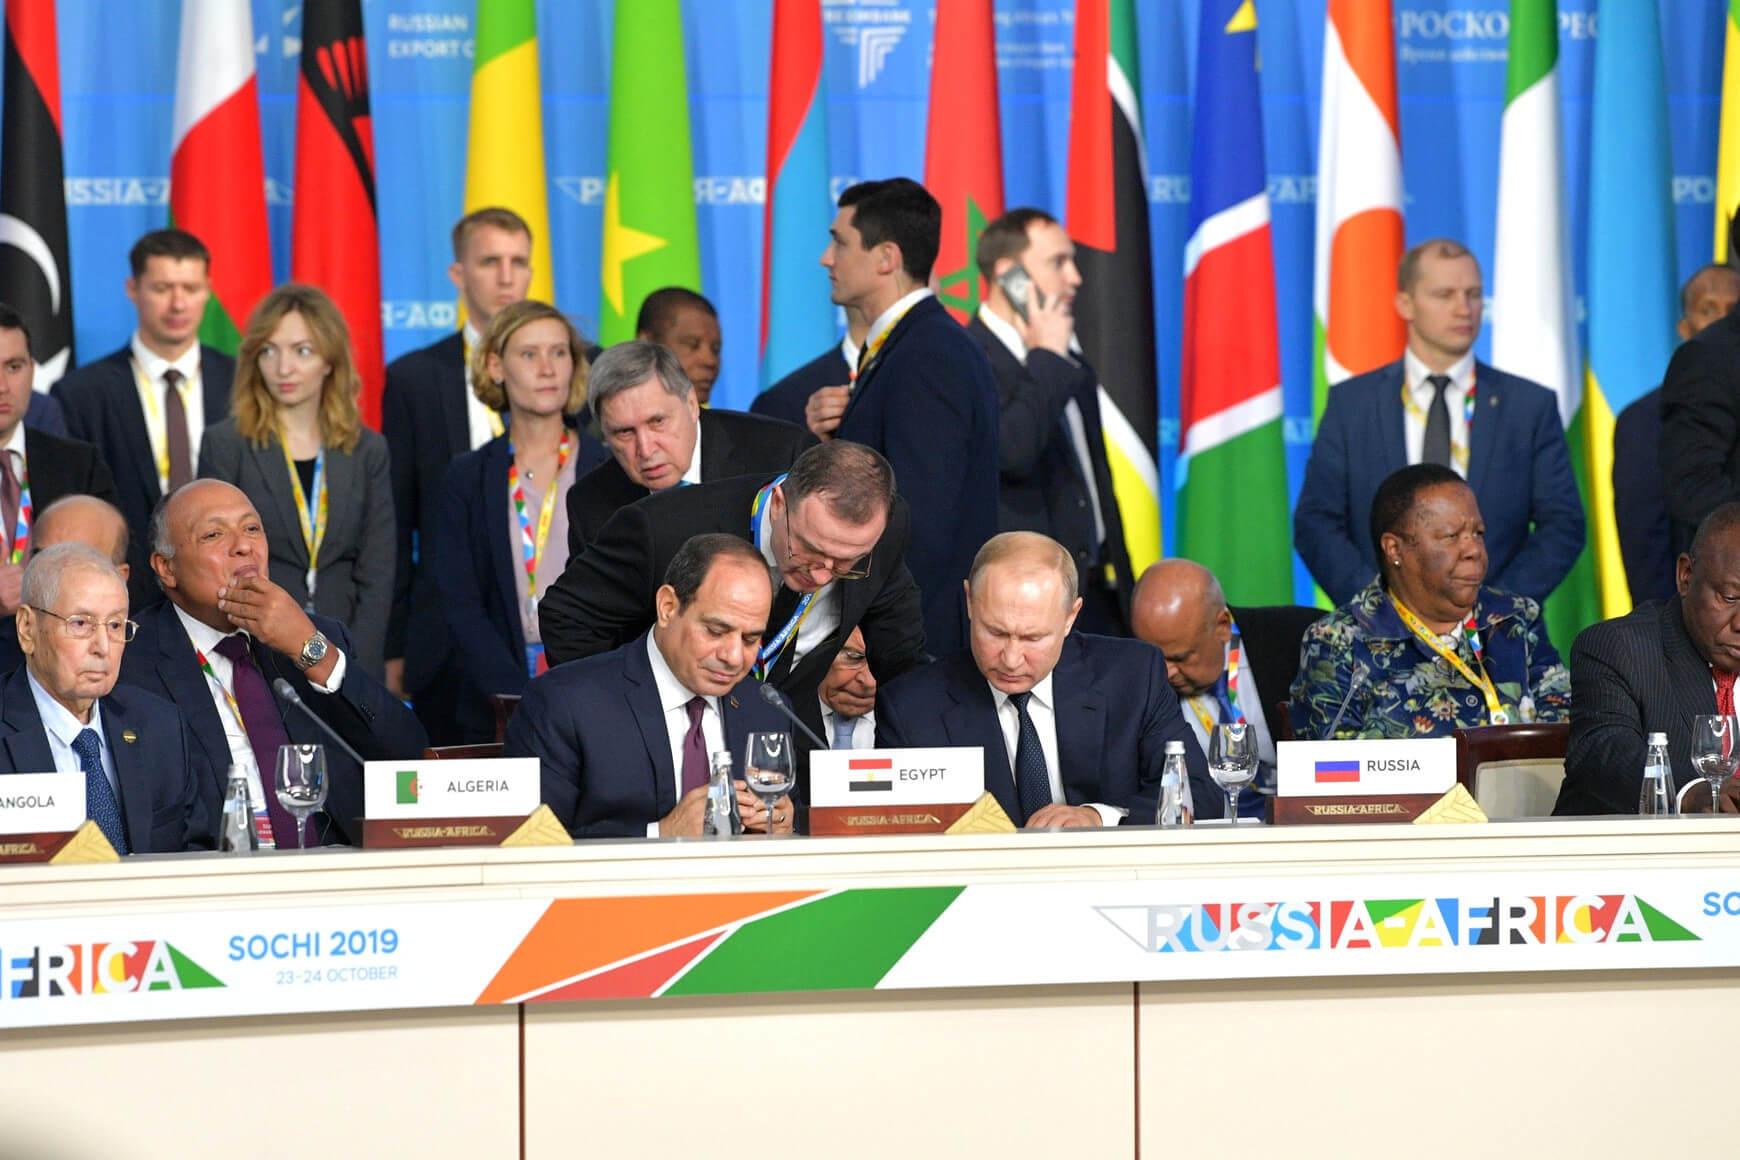 Russia - Africa Summit 2019